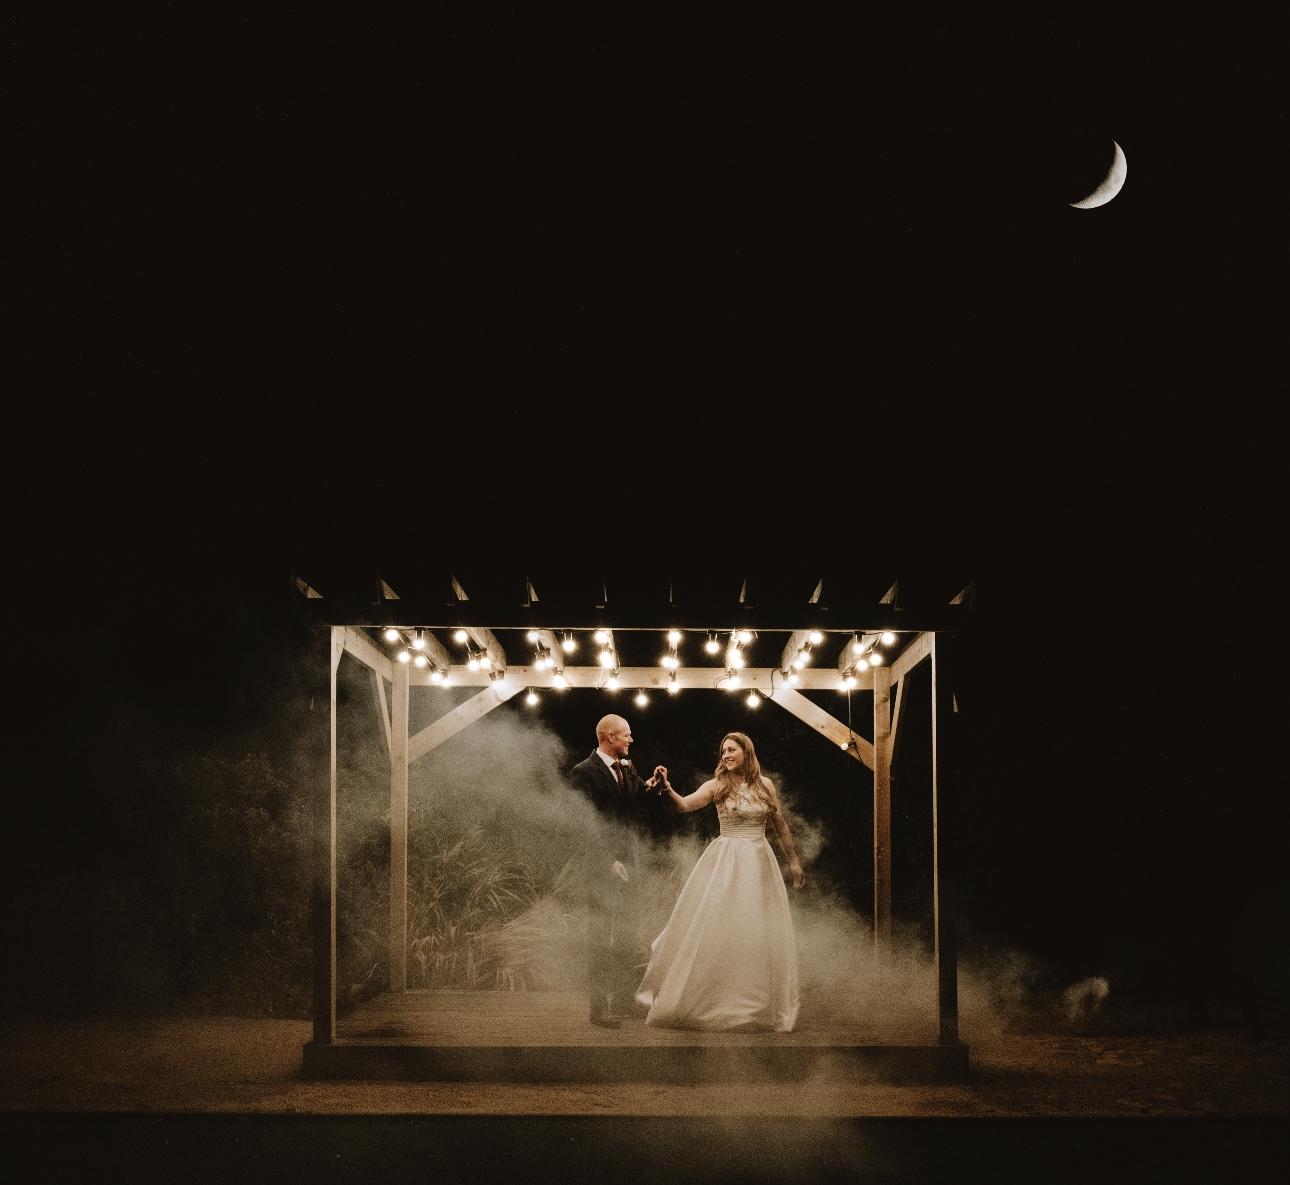 Newlyweds dance under lights